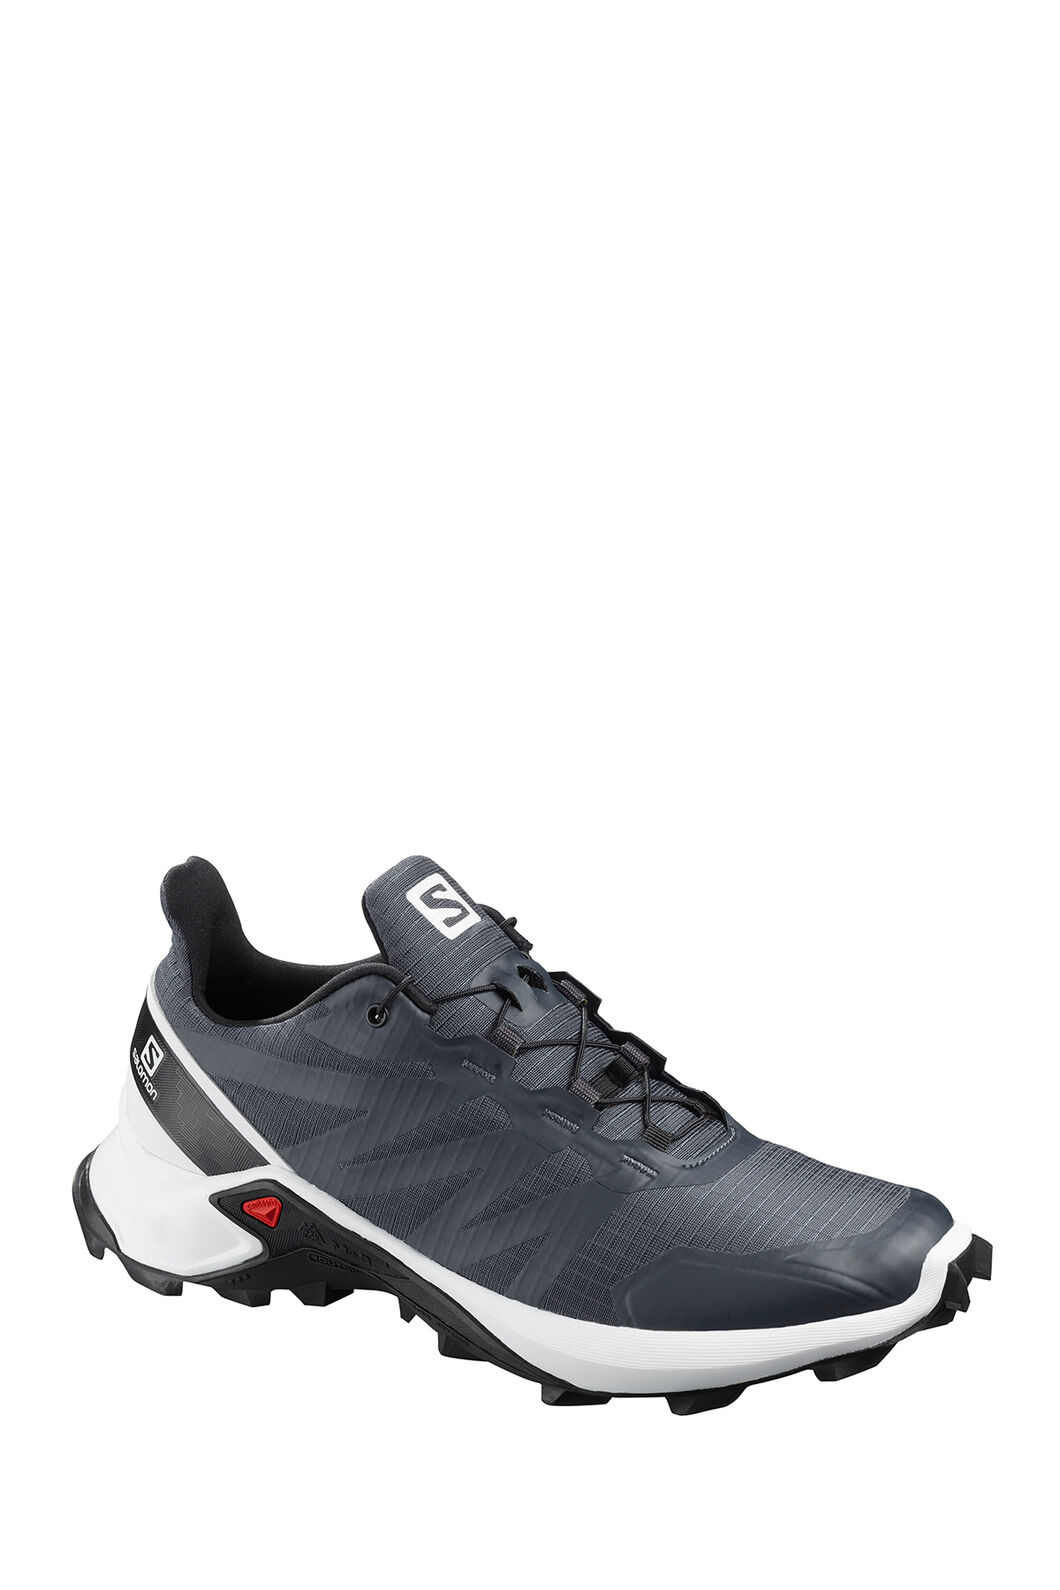 Salomon Supercross Trail Running Shoes — Women's, India Ink/White Black, hi-res